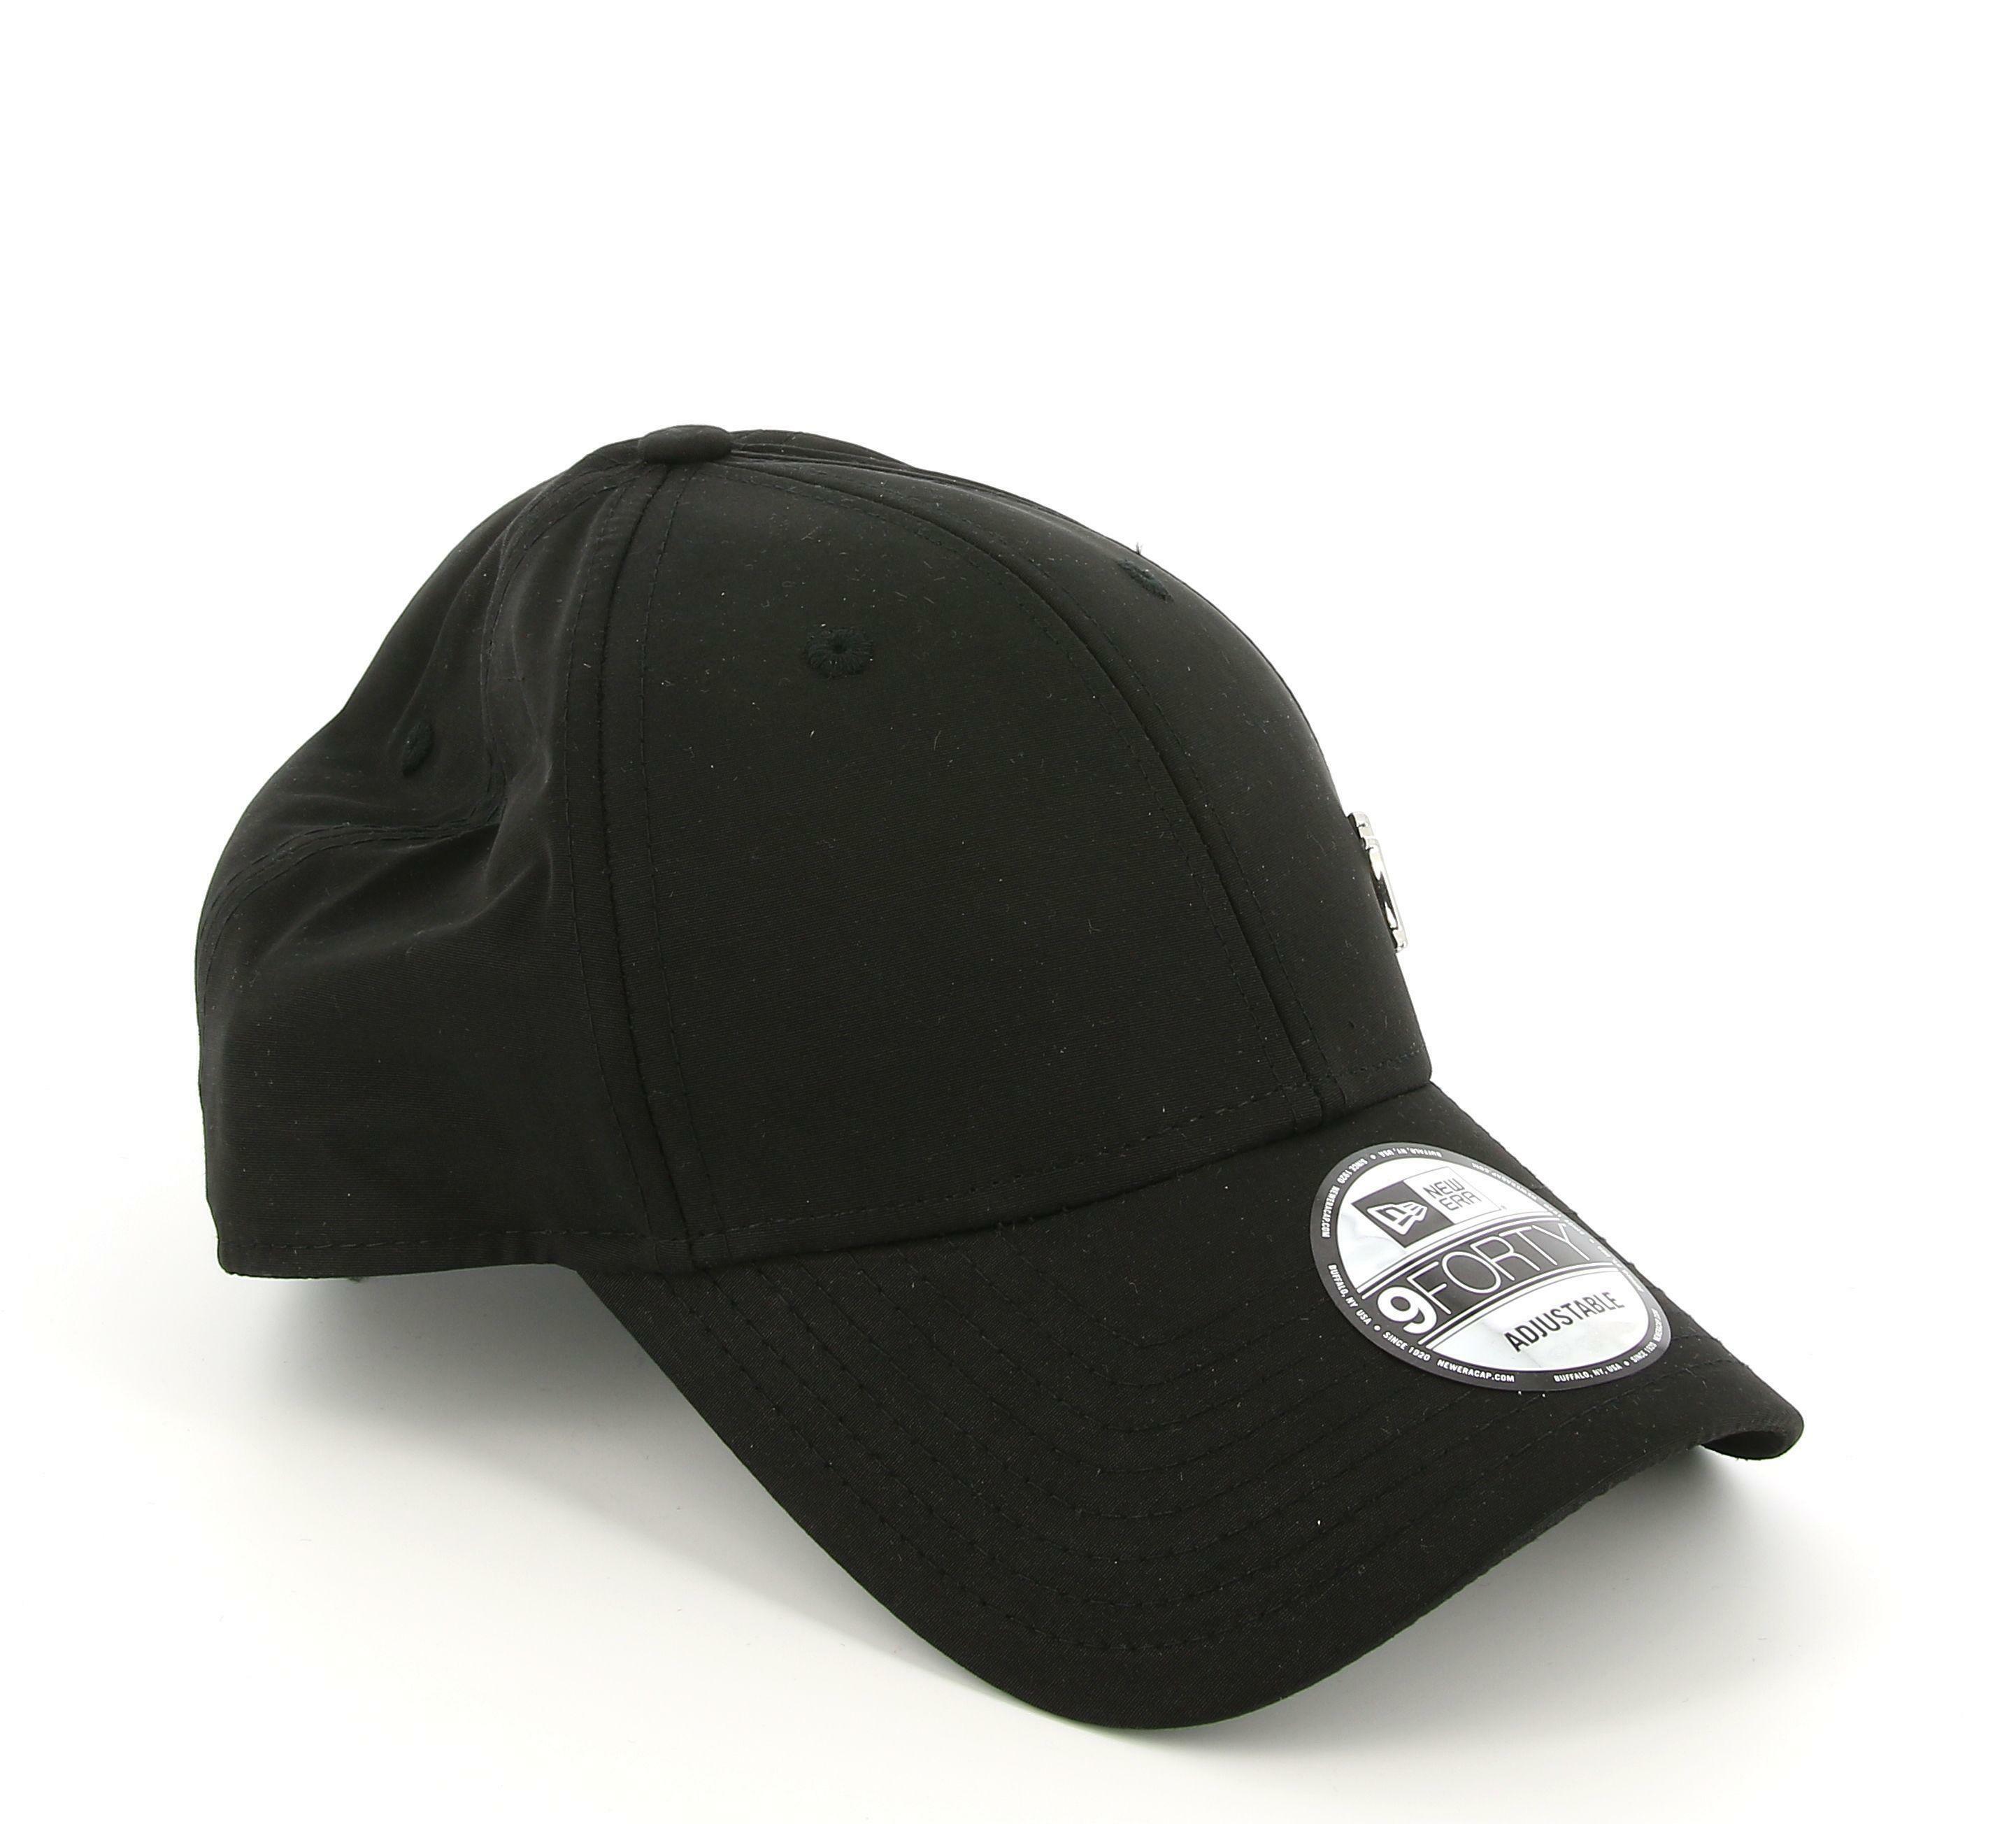 new era new era 11198850 cappello unisex black